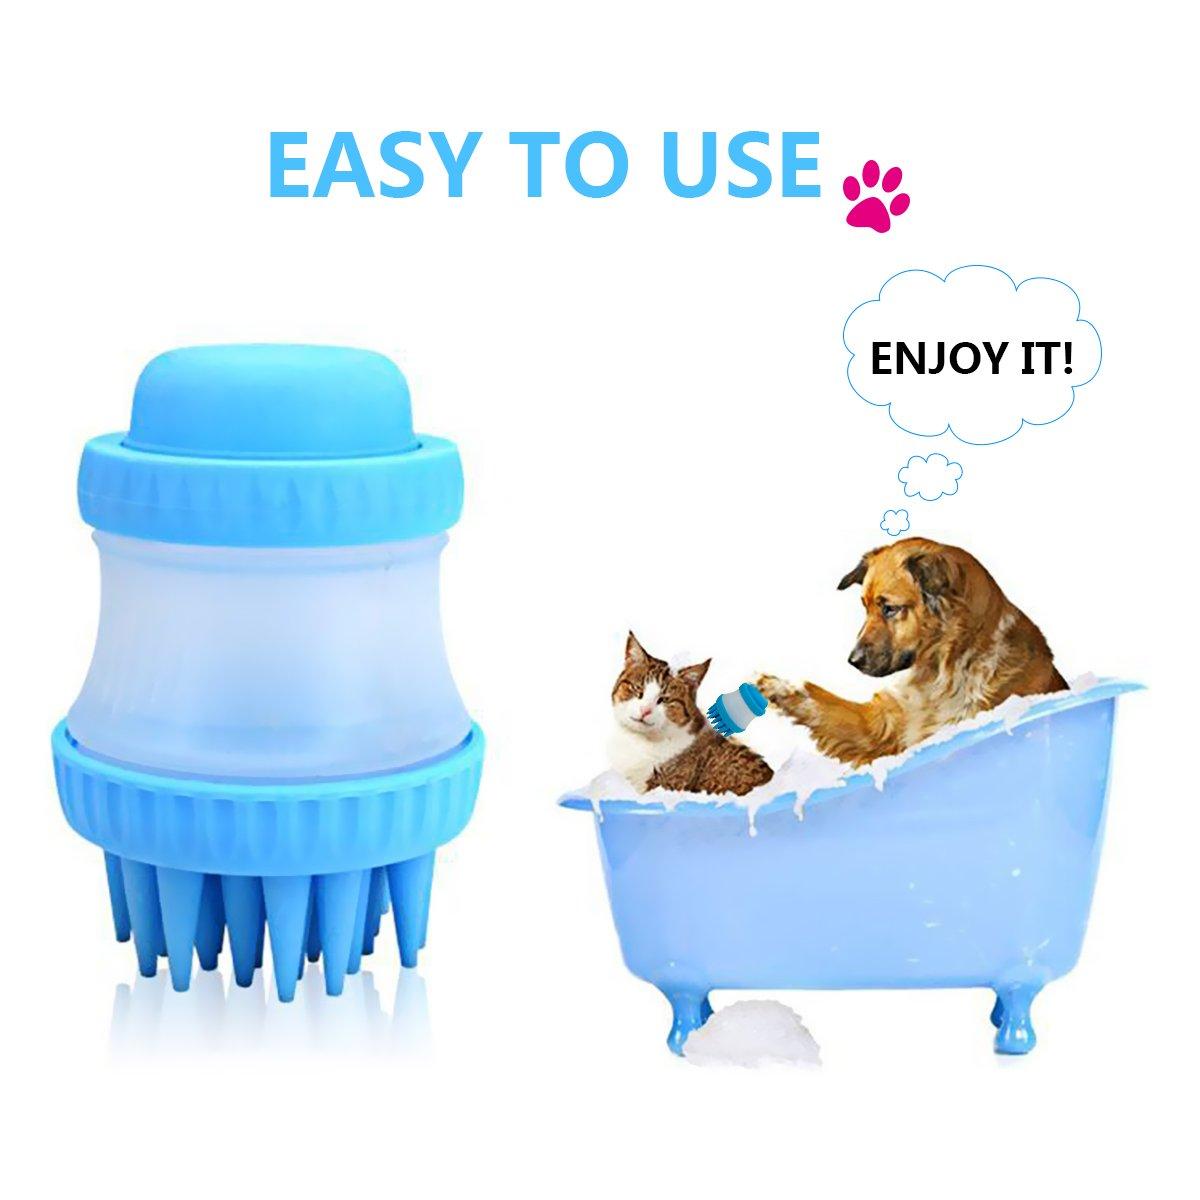 Mascotas Cepillo de masaje para baño HUOU Silicona para mascotas Cepillo de champú Perros Ducha Baño Masajeador Lavador Peine de lavado extraíble con ...